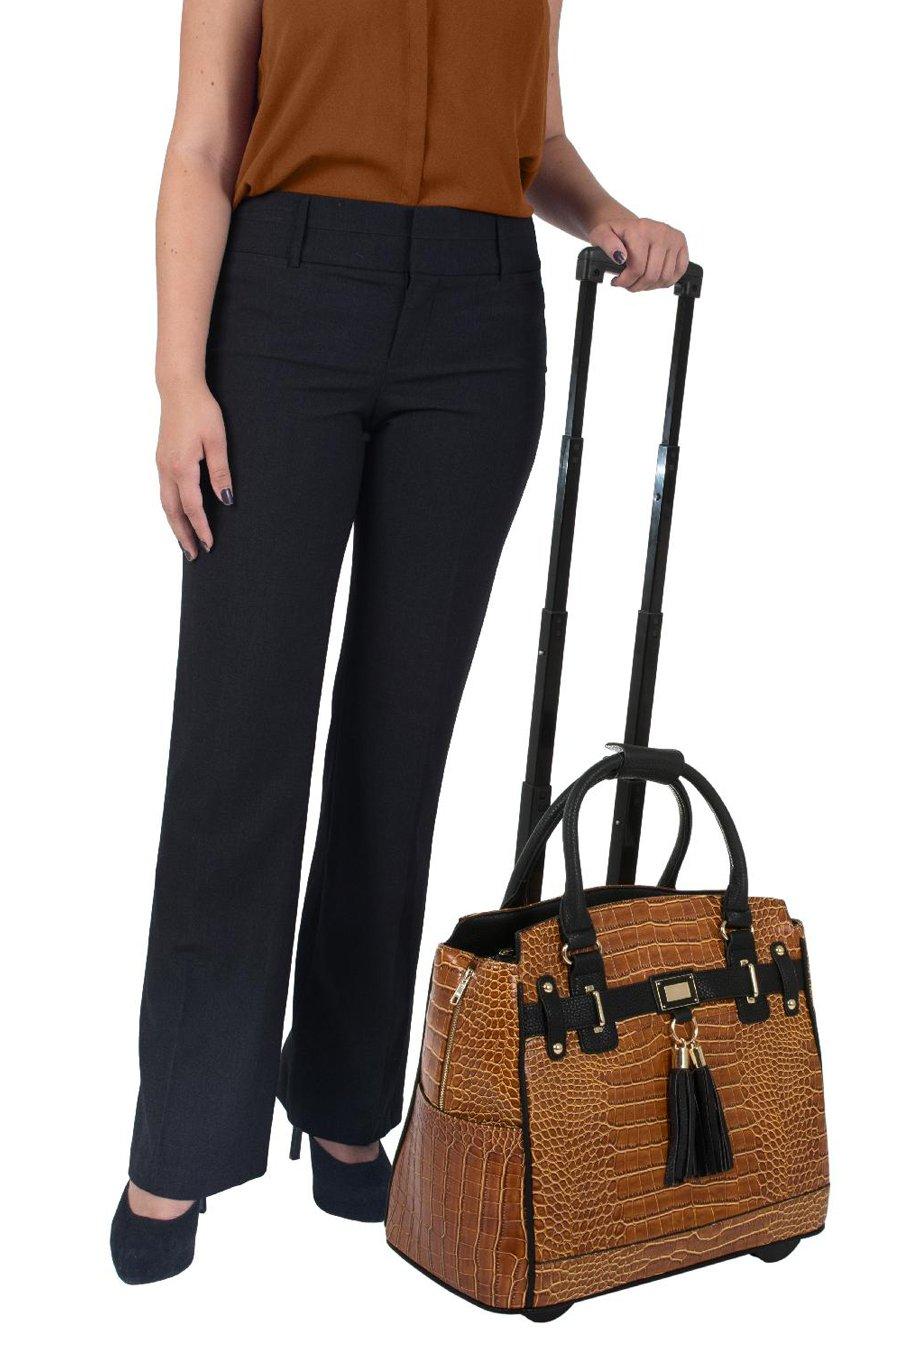 """The Carmel"" Alligator Crocodile Computer iPad, Laptop Tablet Rolling Tote Bag Briefcase Carryall Bag"